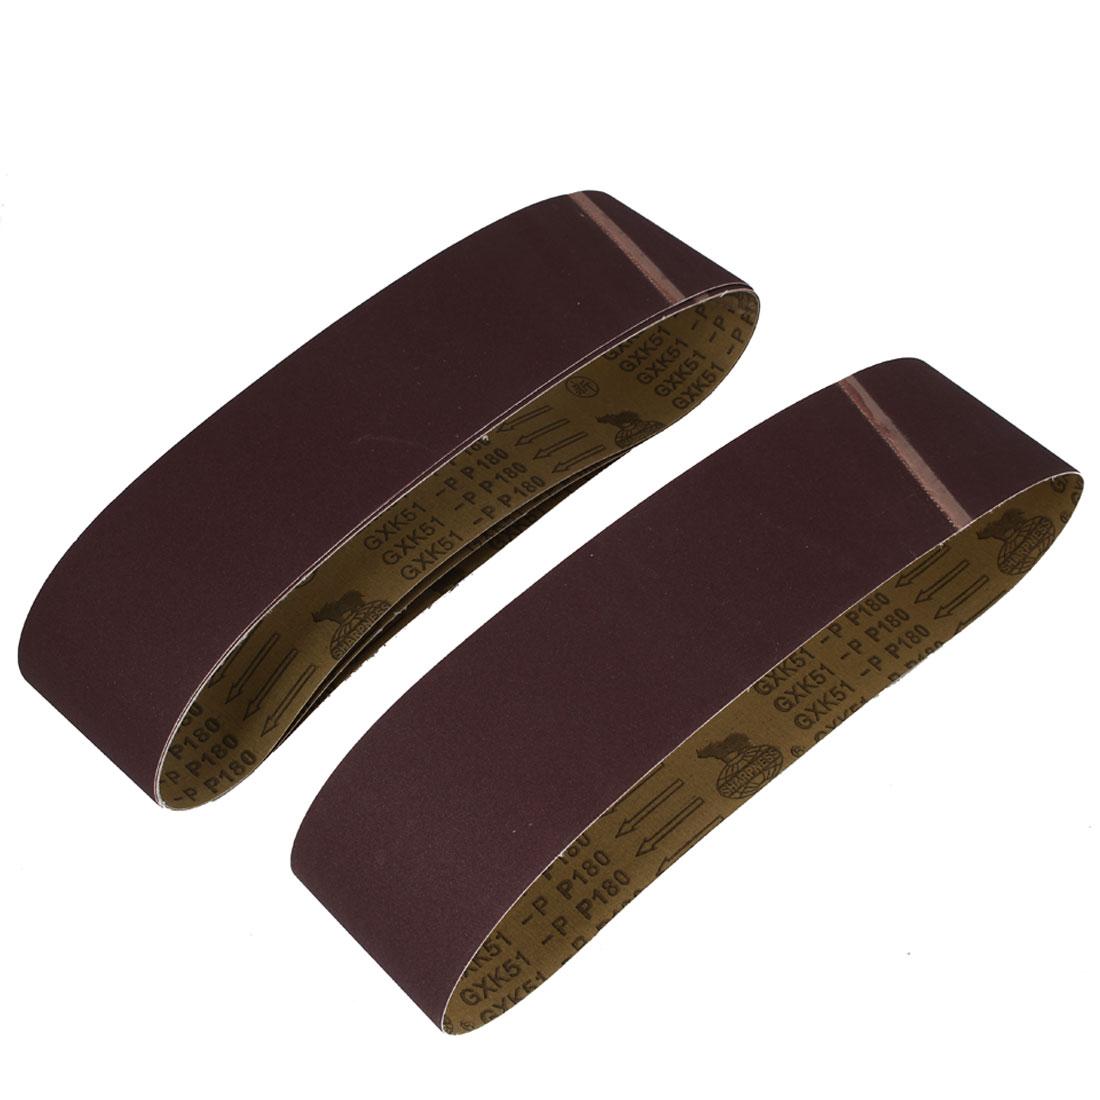 Woodworking 915mmx100mm 180 Grit Abrasive Sanding Belt Sandpaper 5pcs